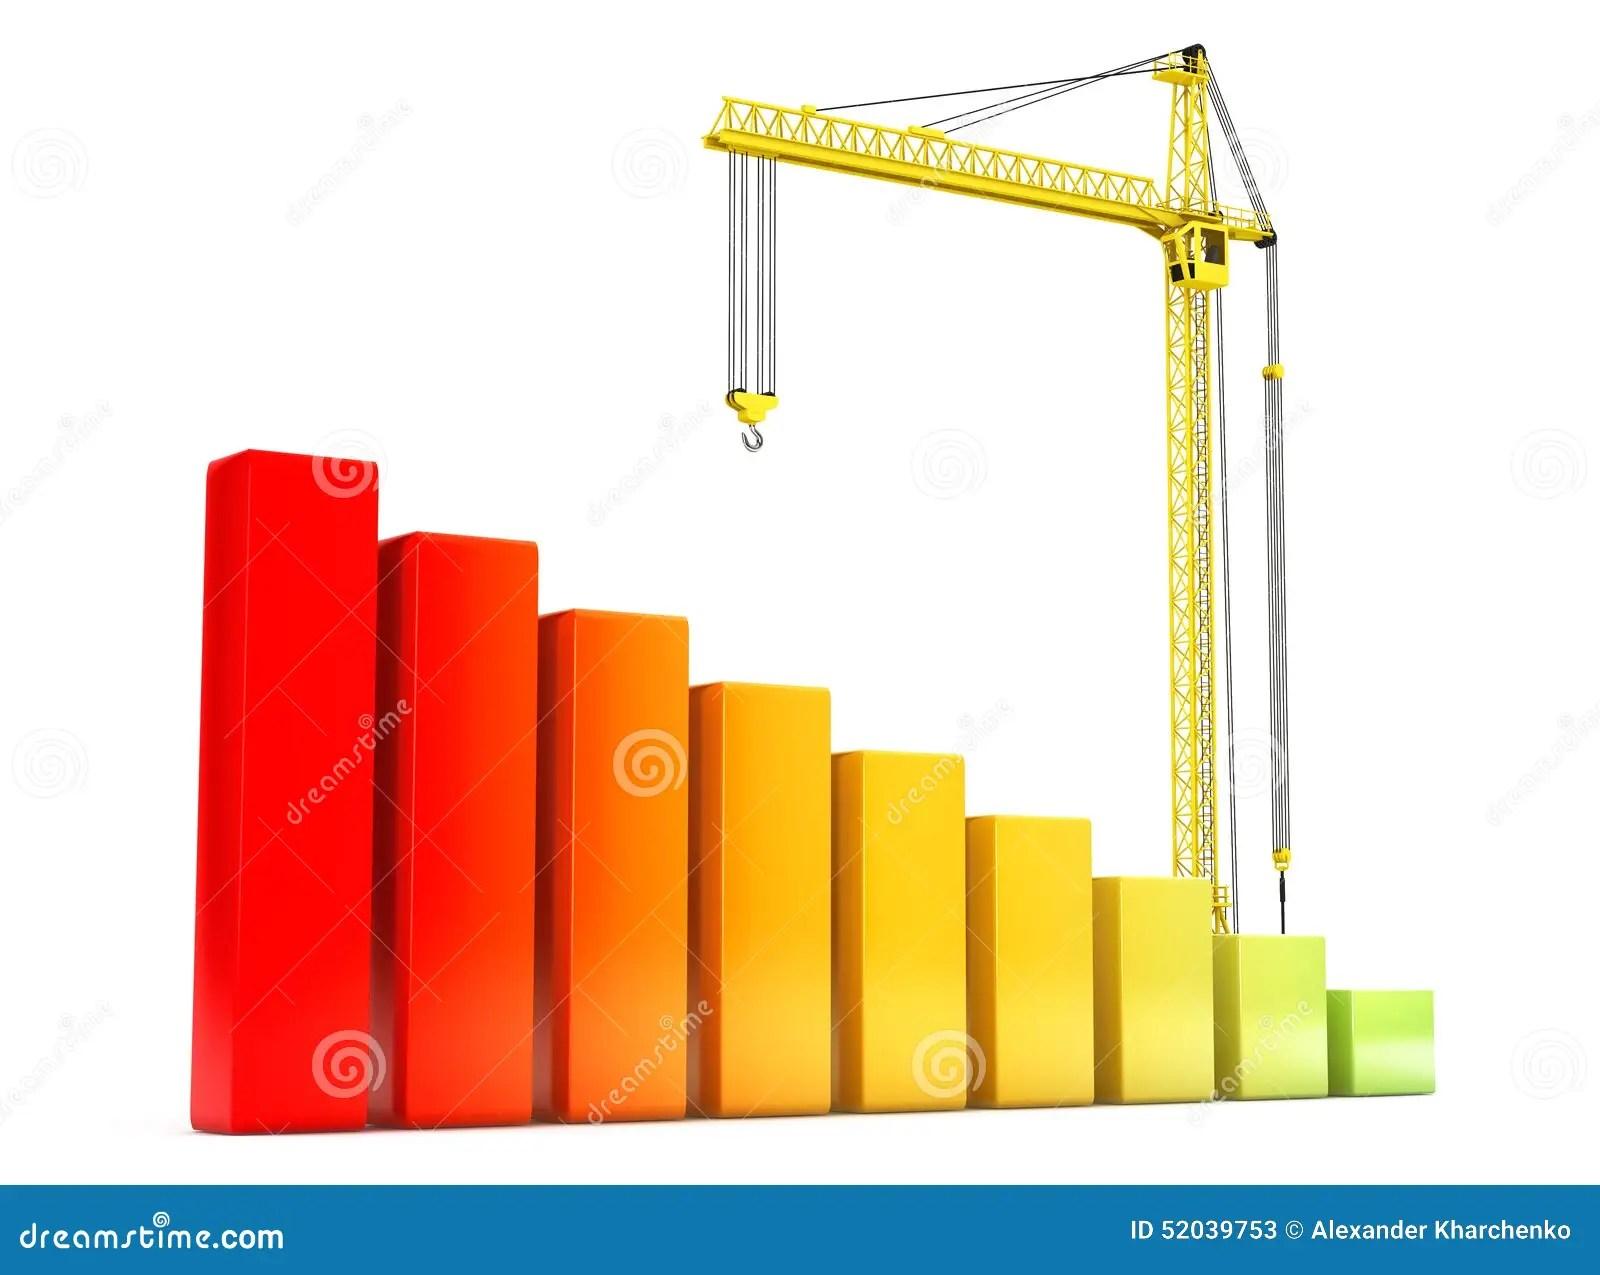 hight resolution of hoisting crane with progress bars